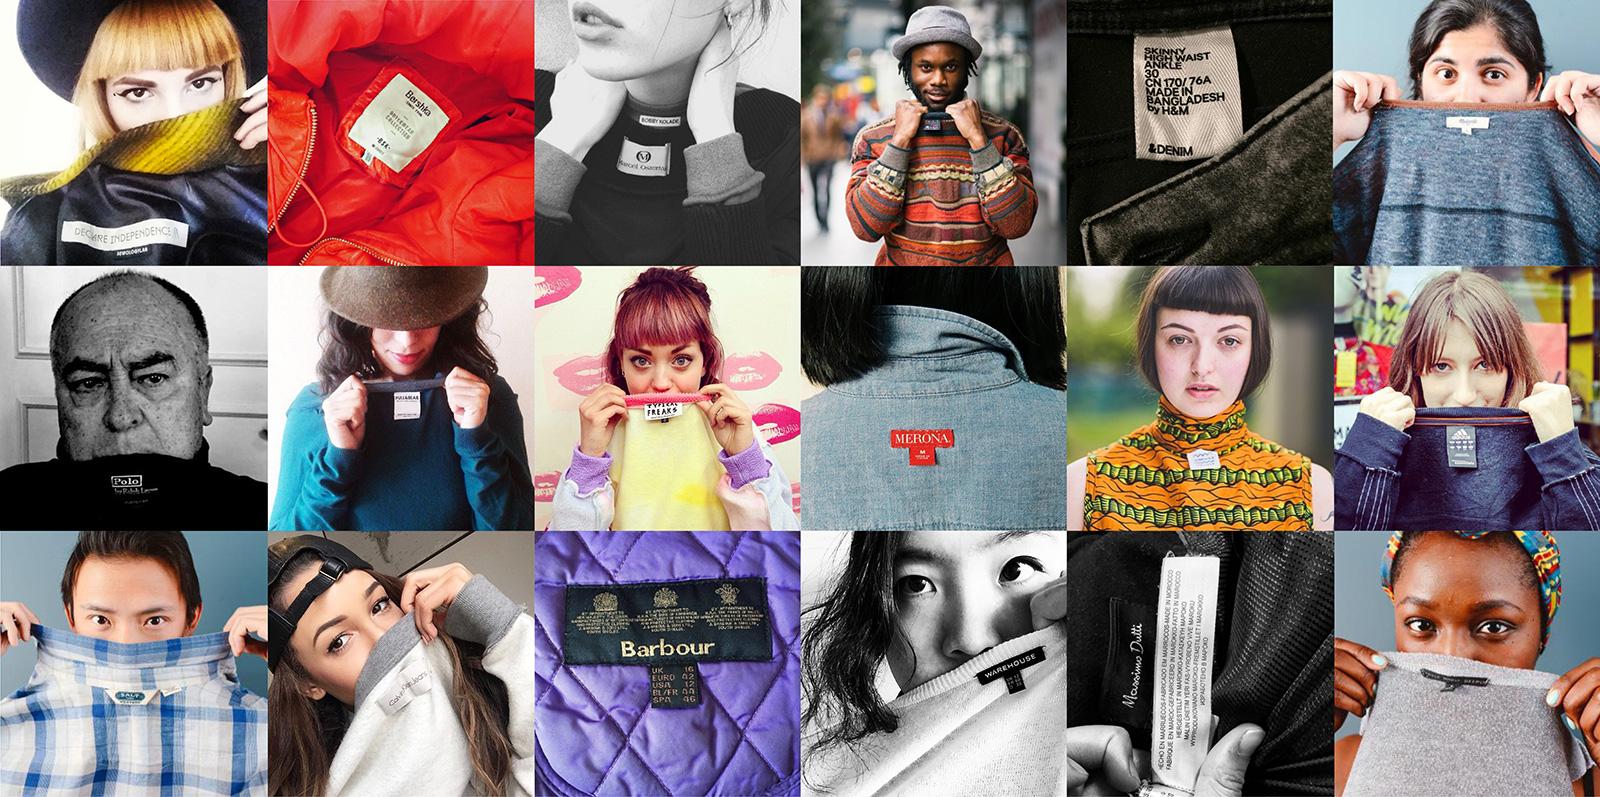 image from  fashionrevolution.org